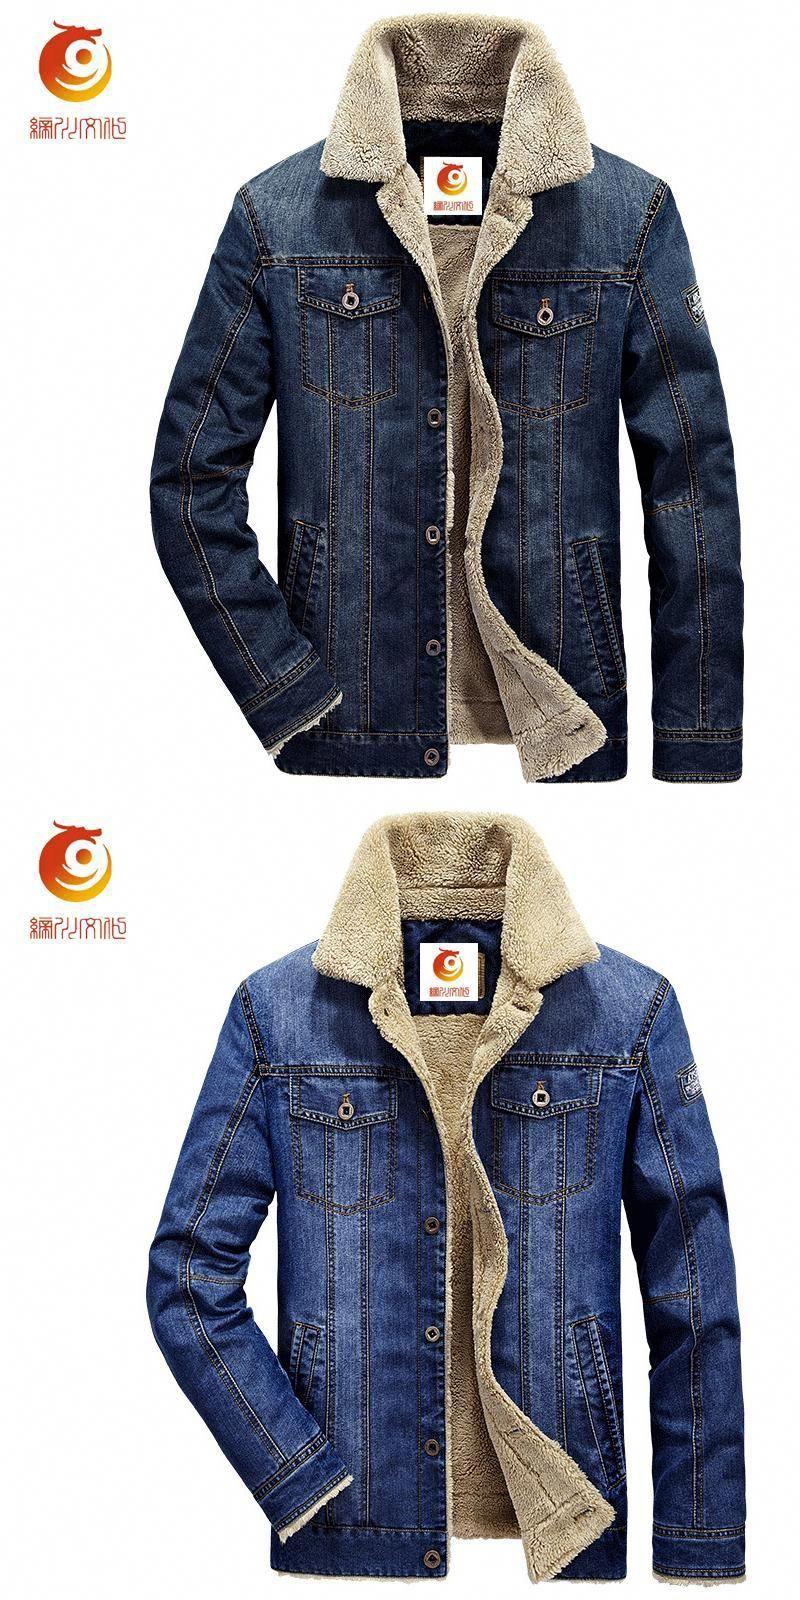 85f4845369 Denim Jacket Fur Collar Men 2017 Winter Retro Warm Denim Jackets Thick Wool  Men Outwear Fashion Mens Jeans Jacket Cowboy Coats  MensJeans